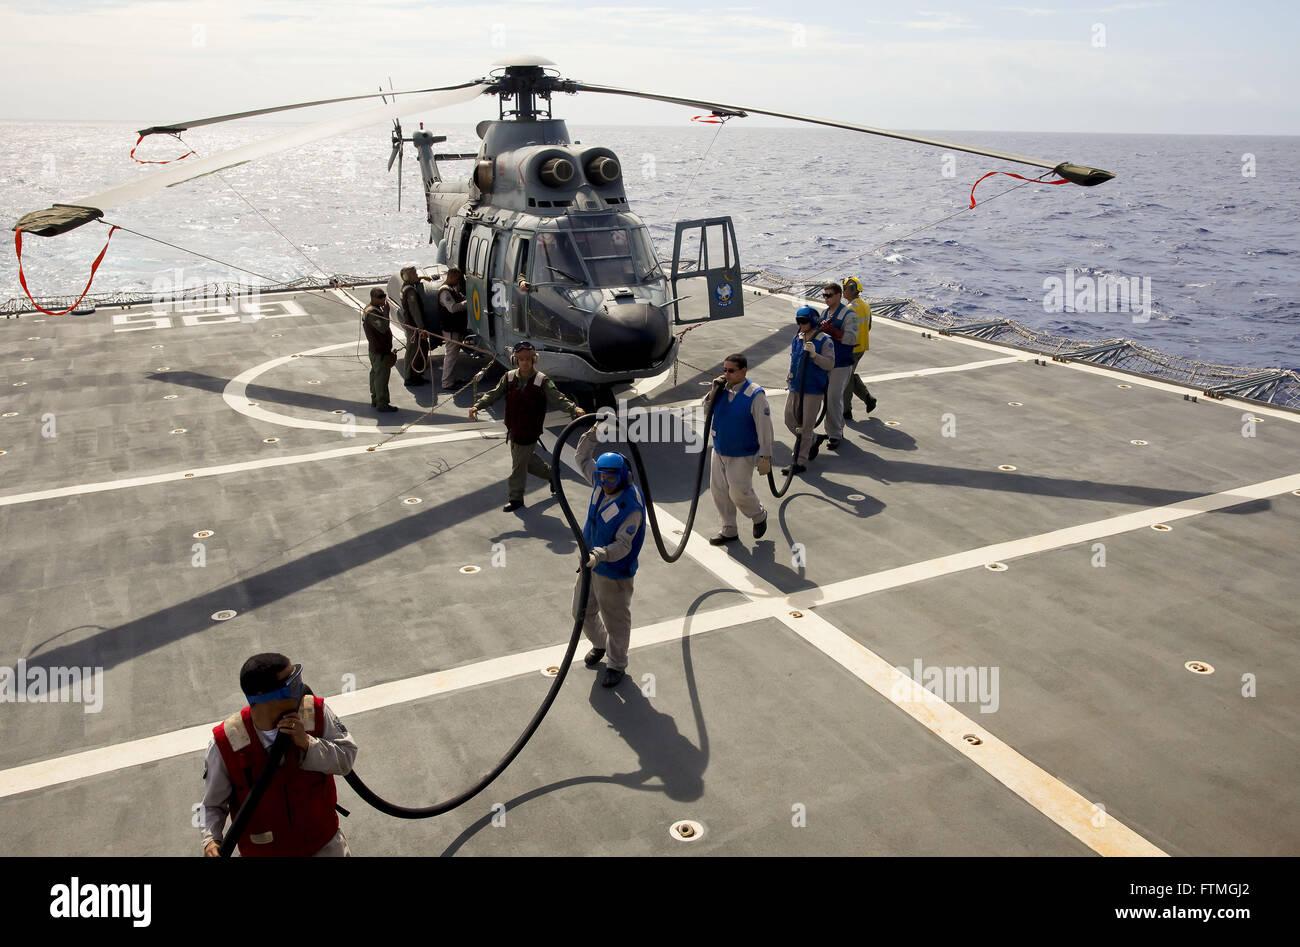 Super Puma Helicopteo en Descarga de Barcos Alquiler combatir NDCC en Isla Trindade. Imagen De Stock